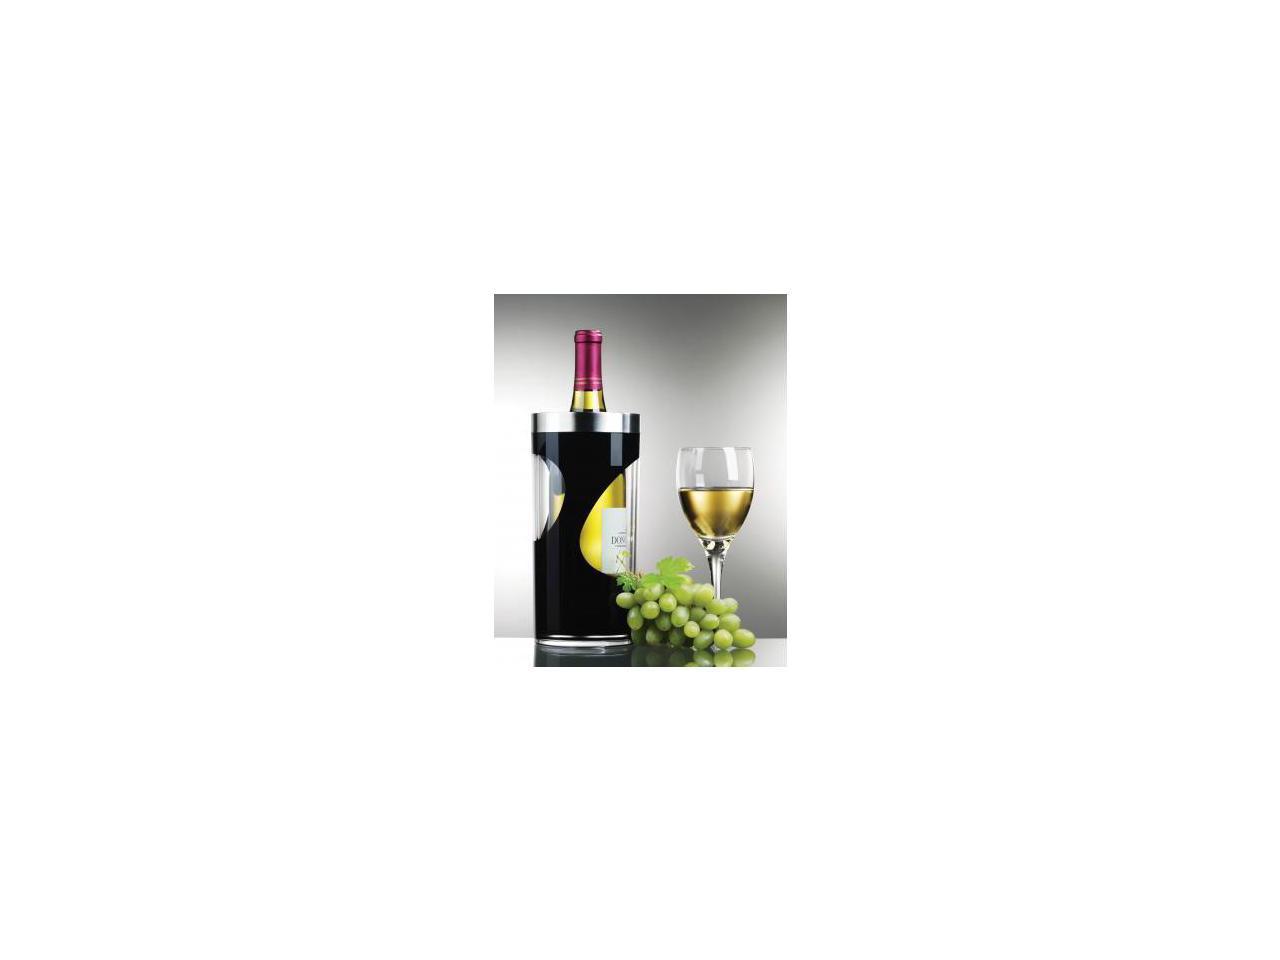 Prodyne A903b Black Wine Cooler Two Tone Iceless Swirl Design Newegg Com